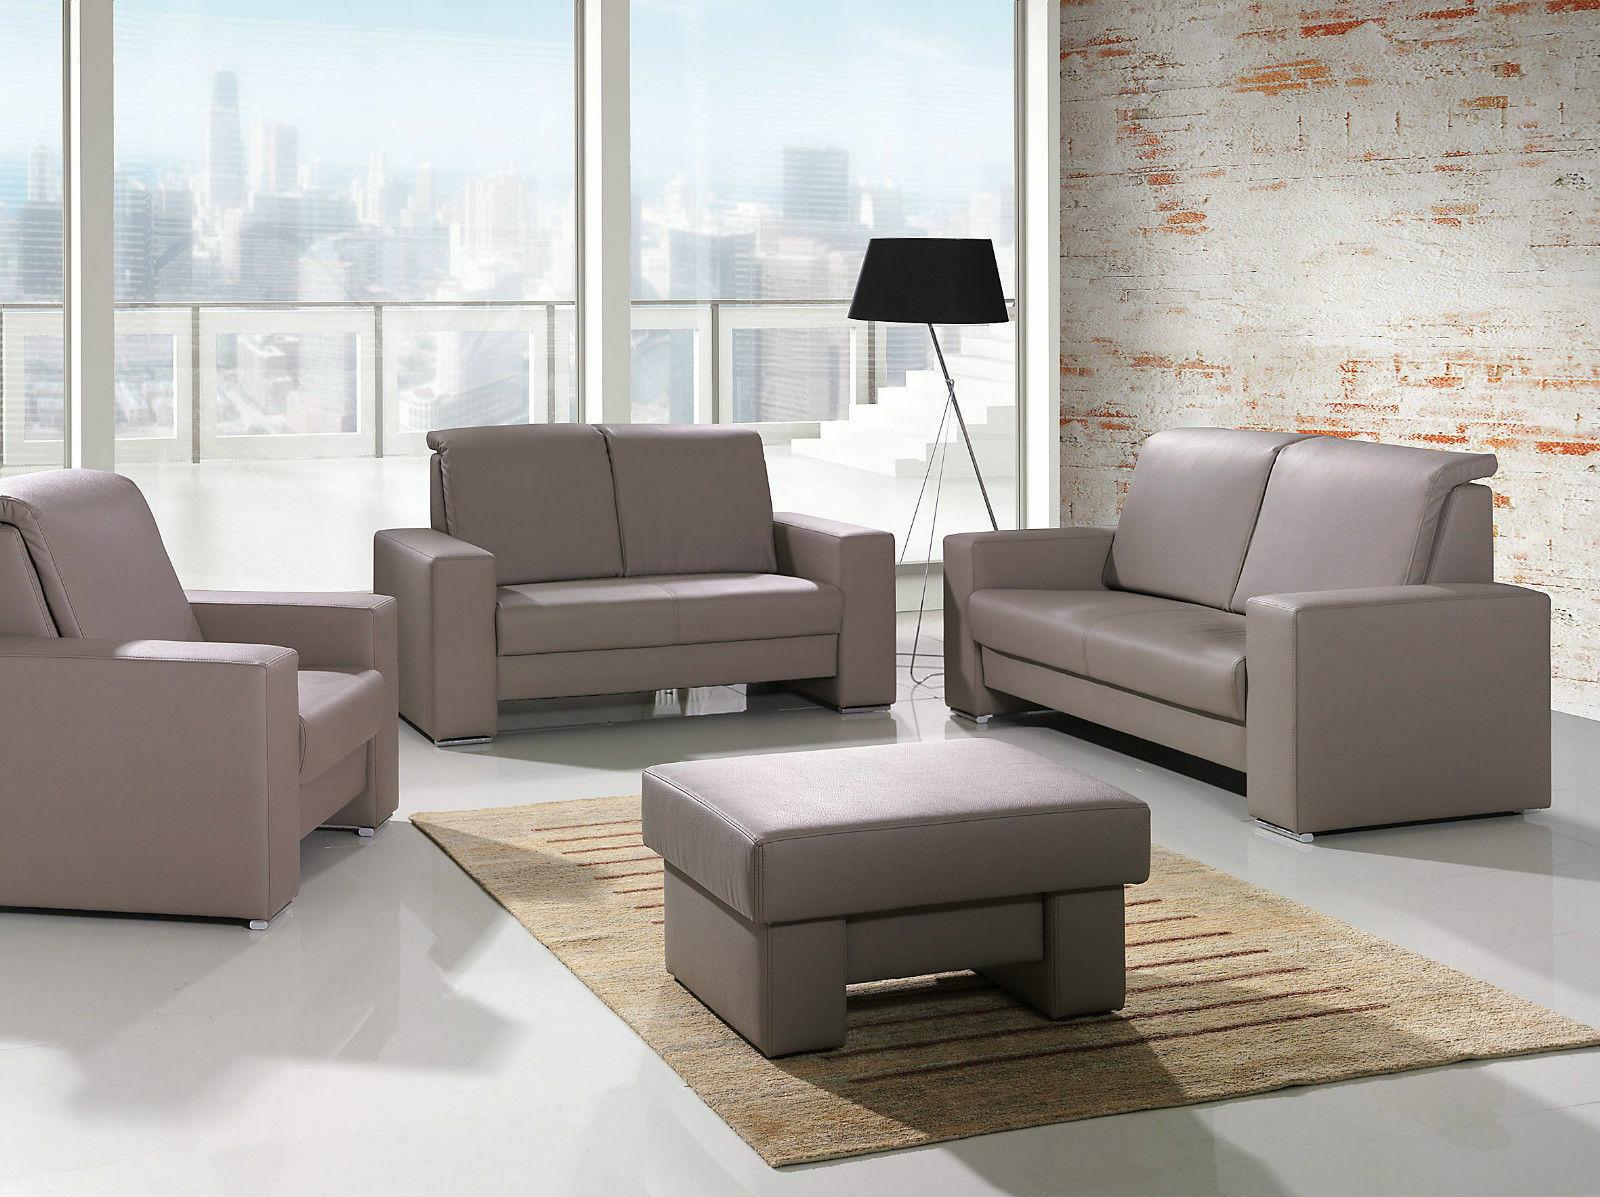 Couch Polster Sofa Garnitur Set Polsterecke Nellie 3 2 1 Hocker